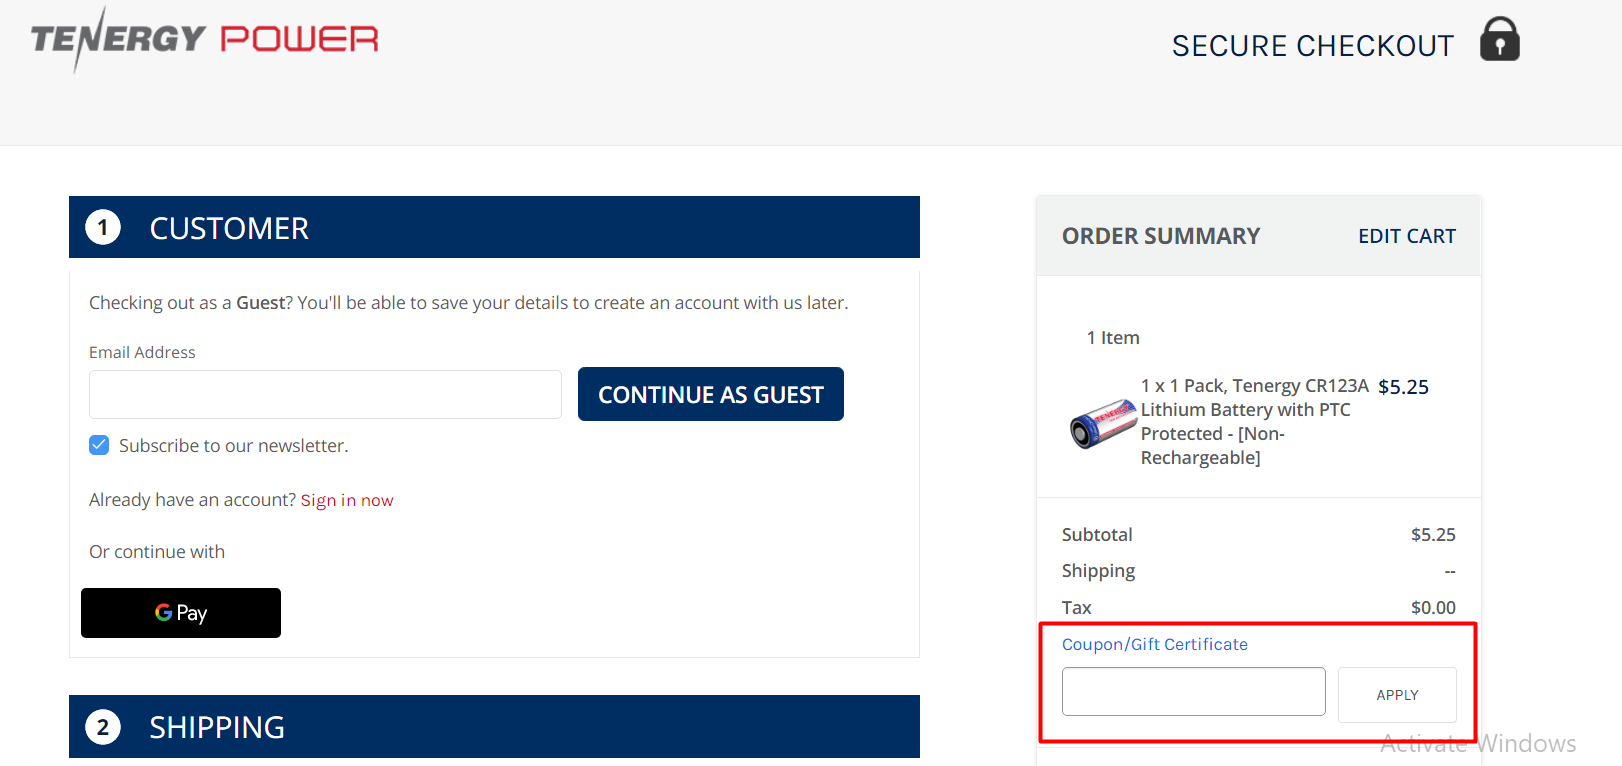 How do I use my Tenergy discount code?